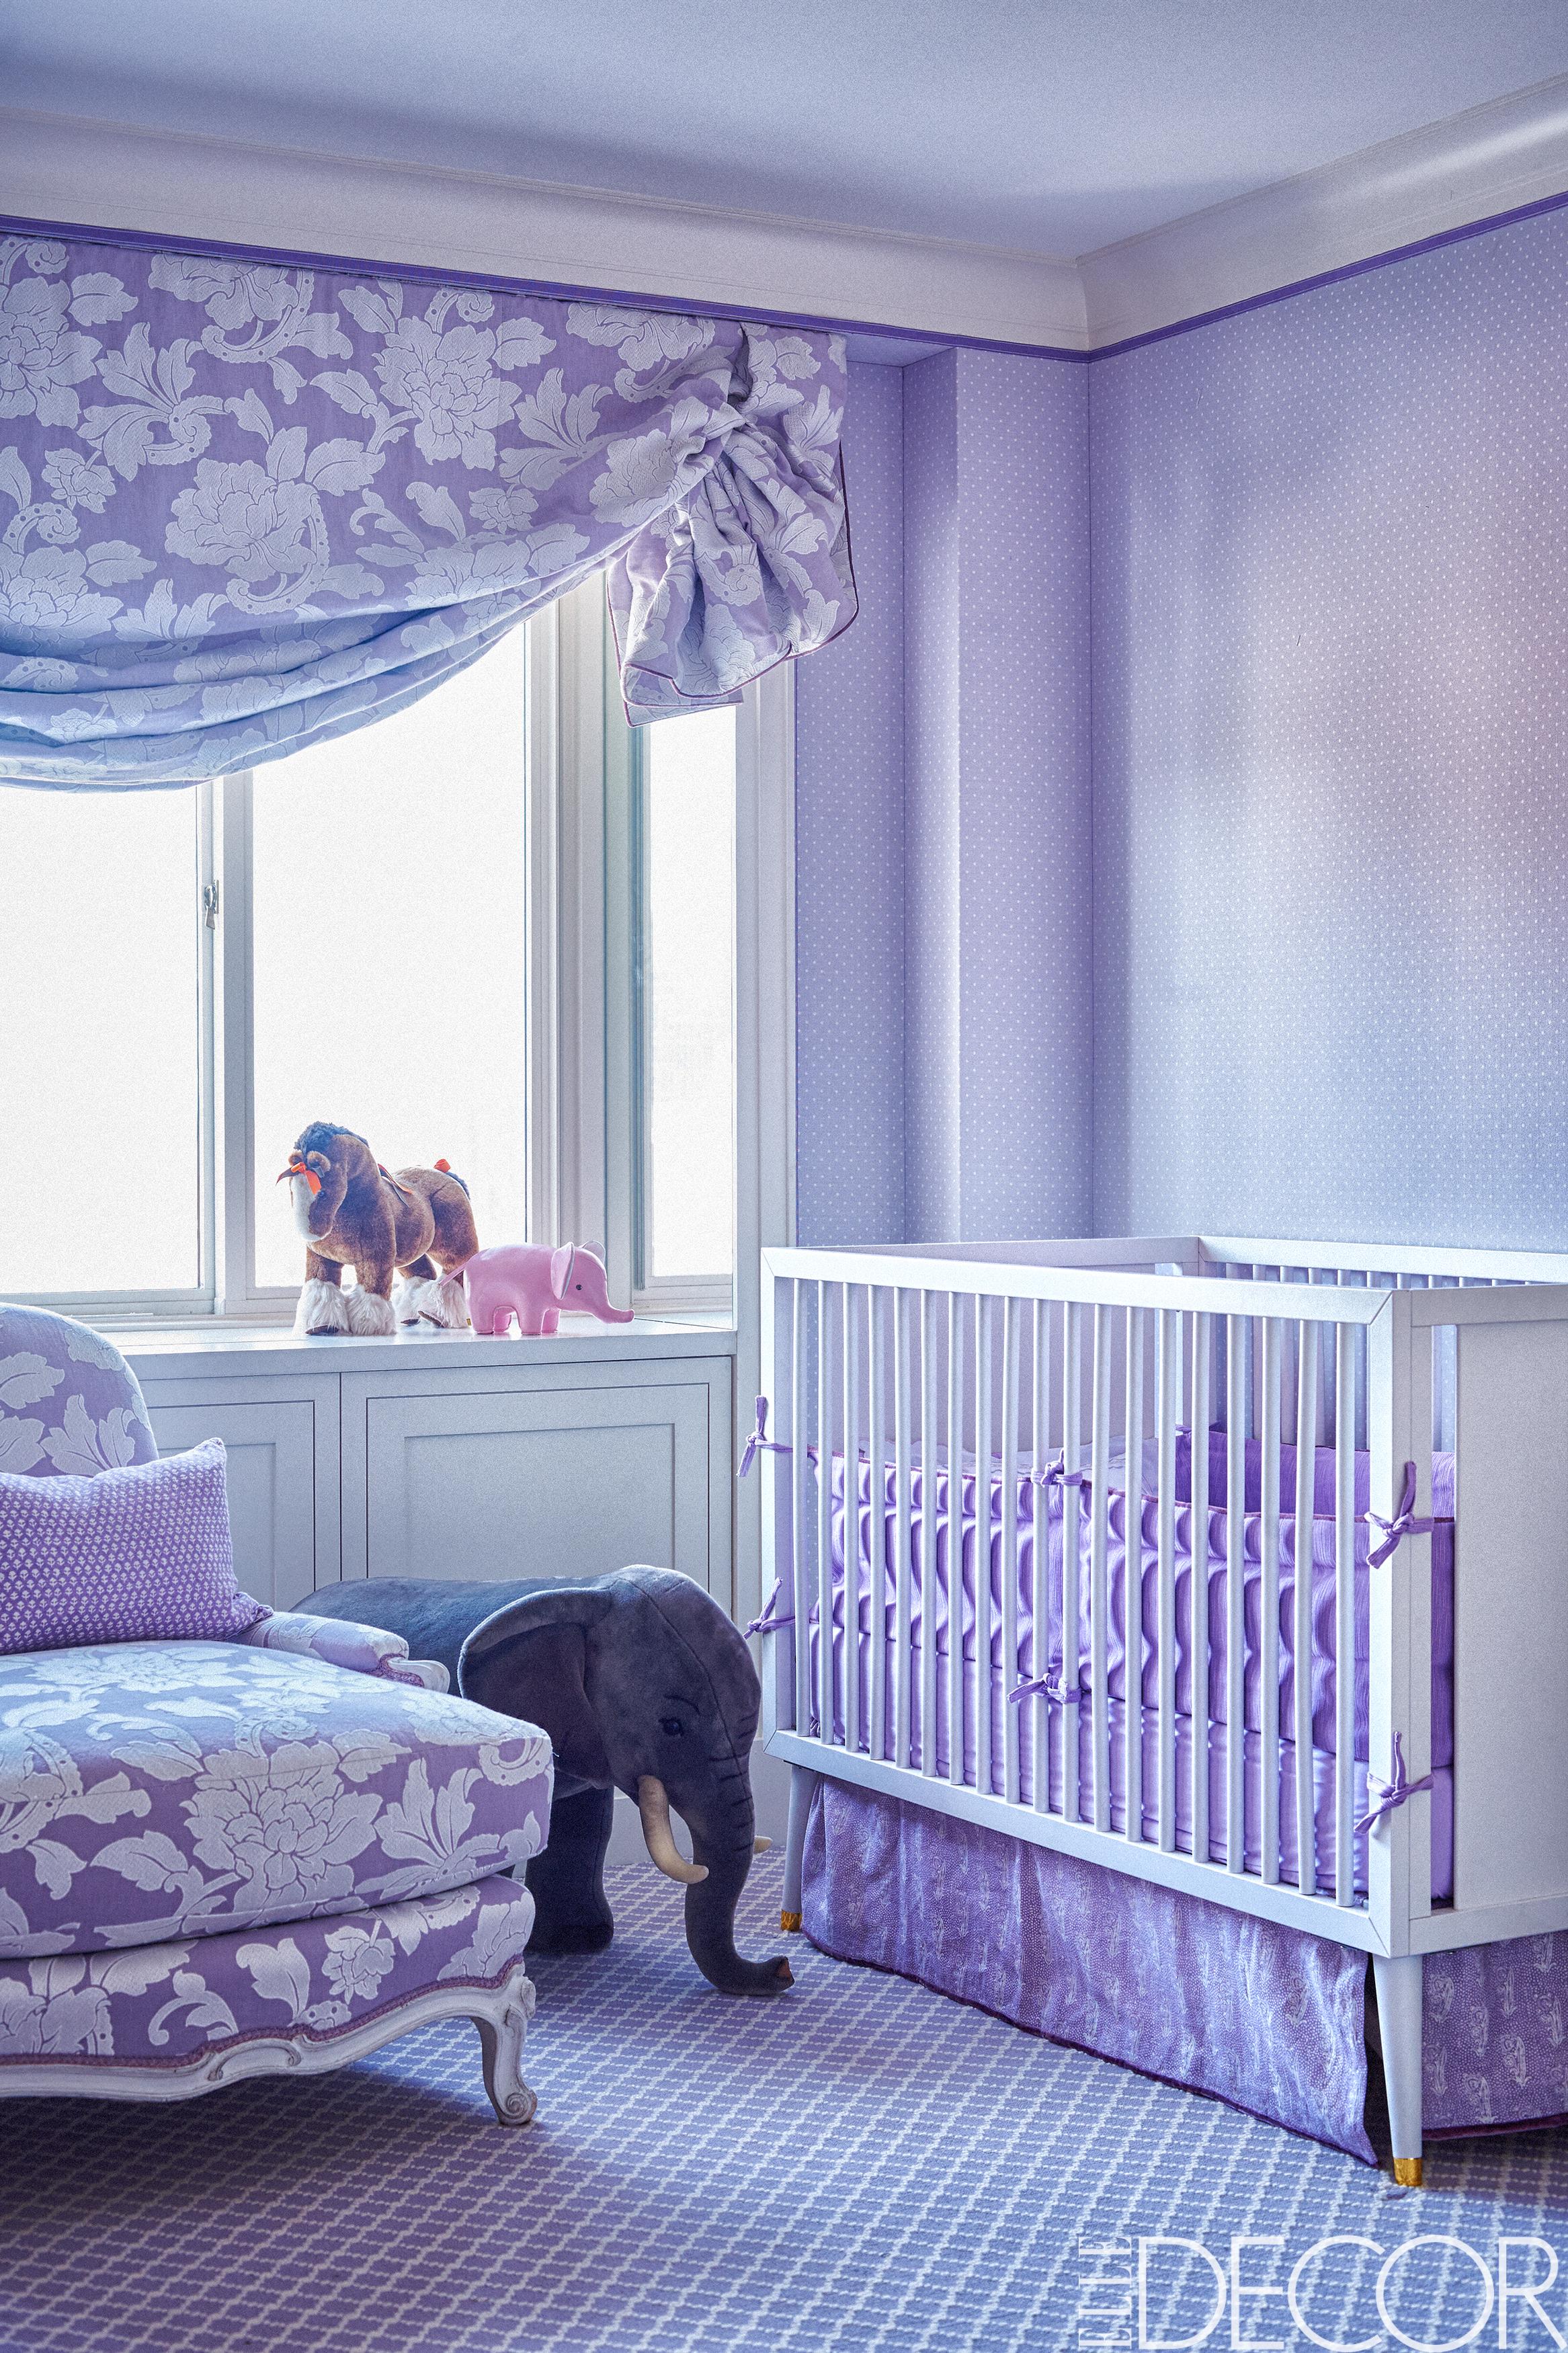 8 Best Baby Room Ideas - Nursery Decorating Furniture & Decor